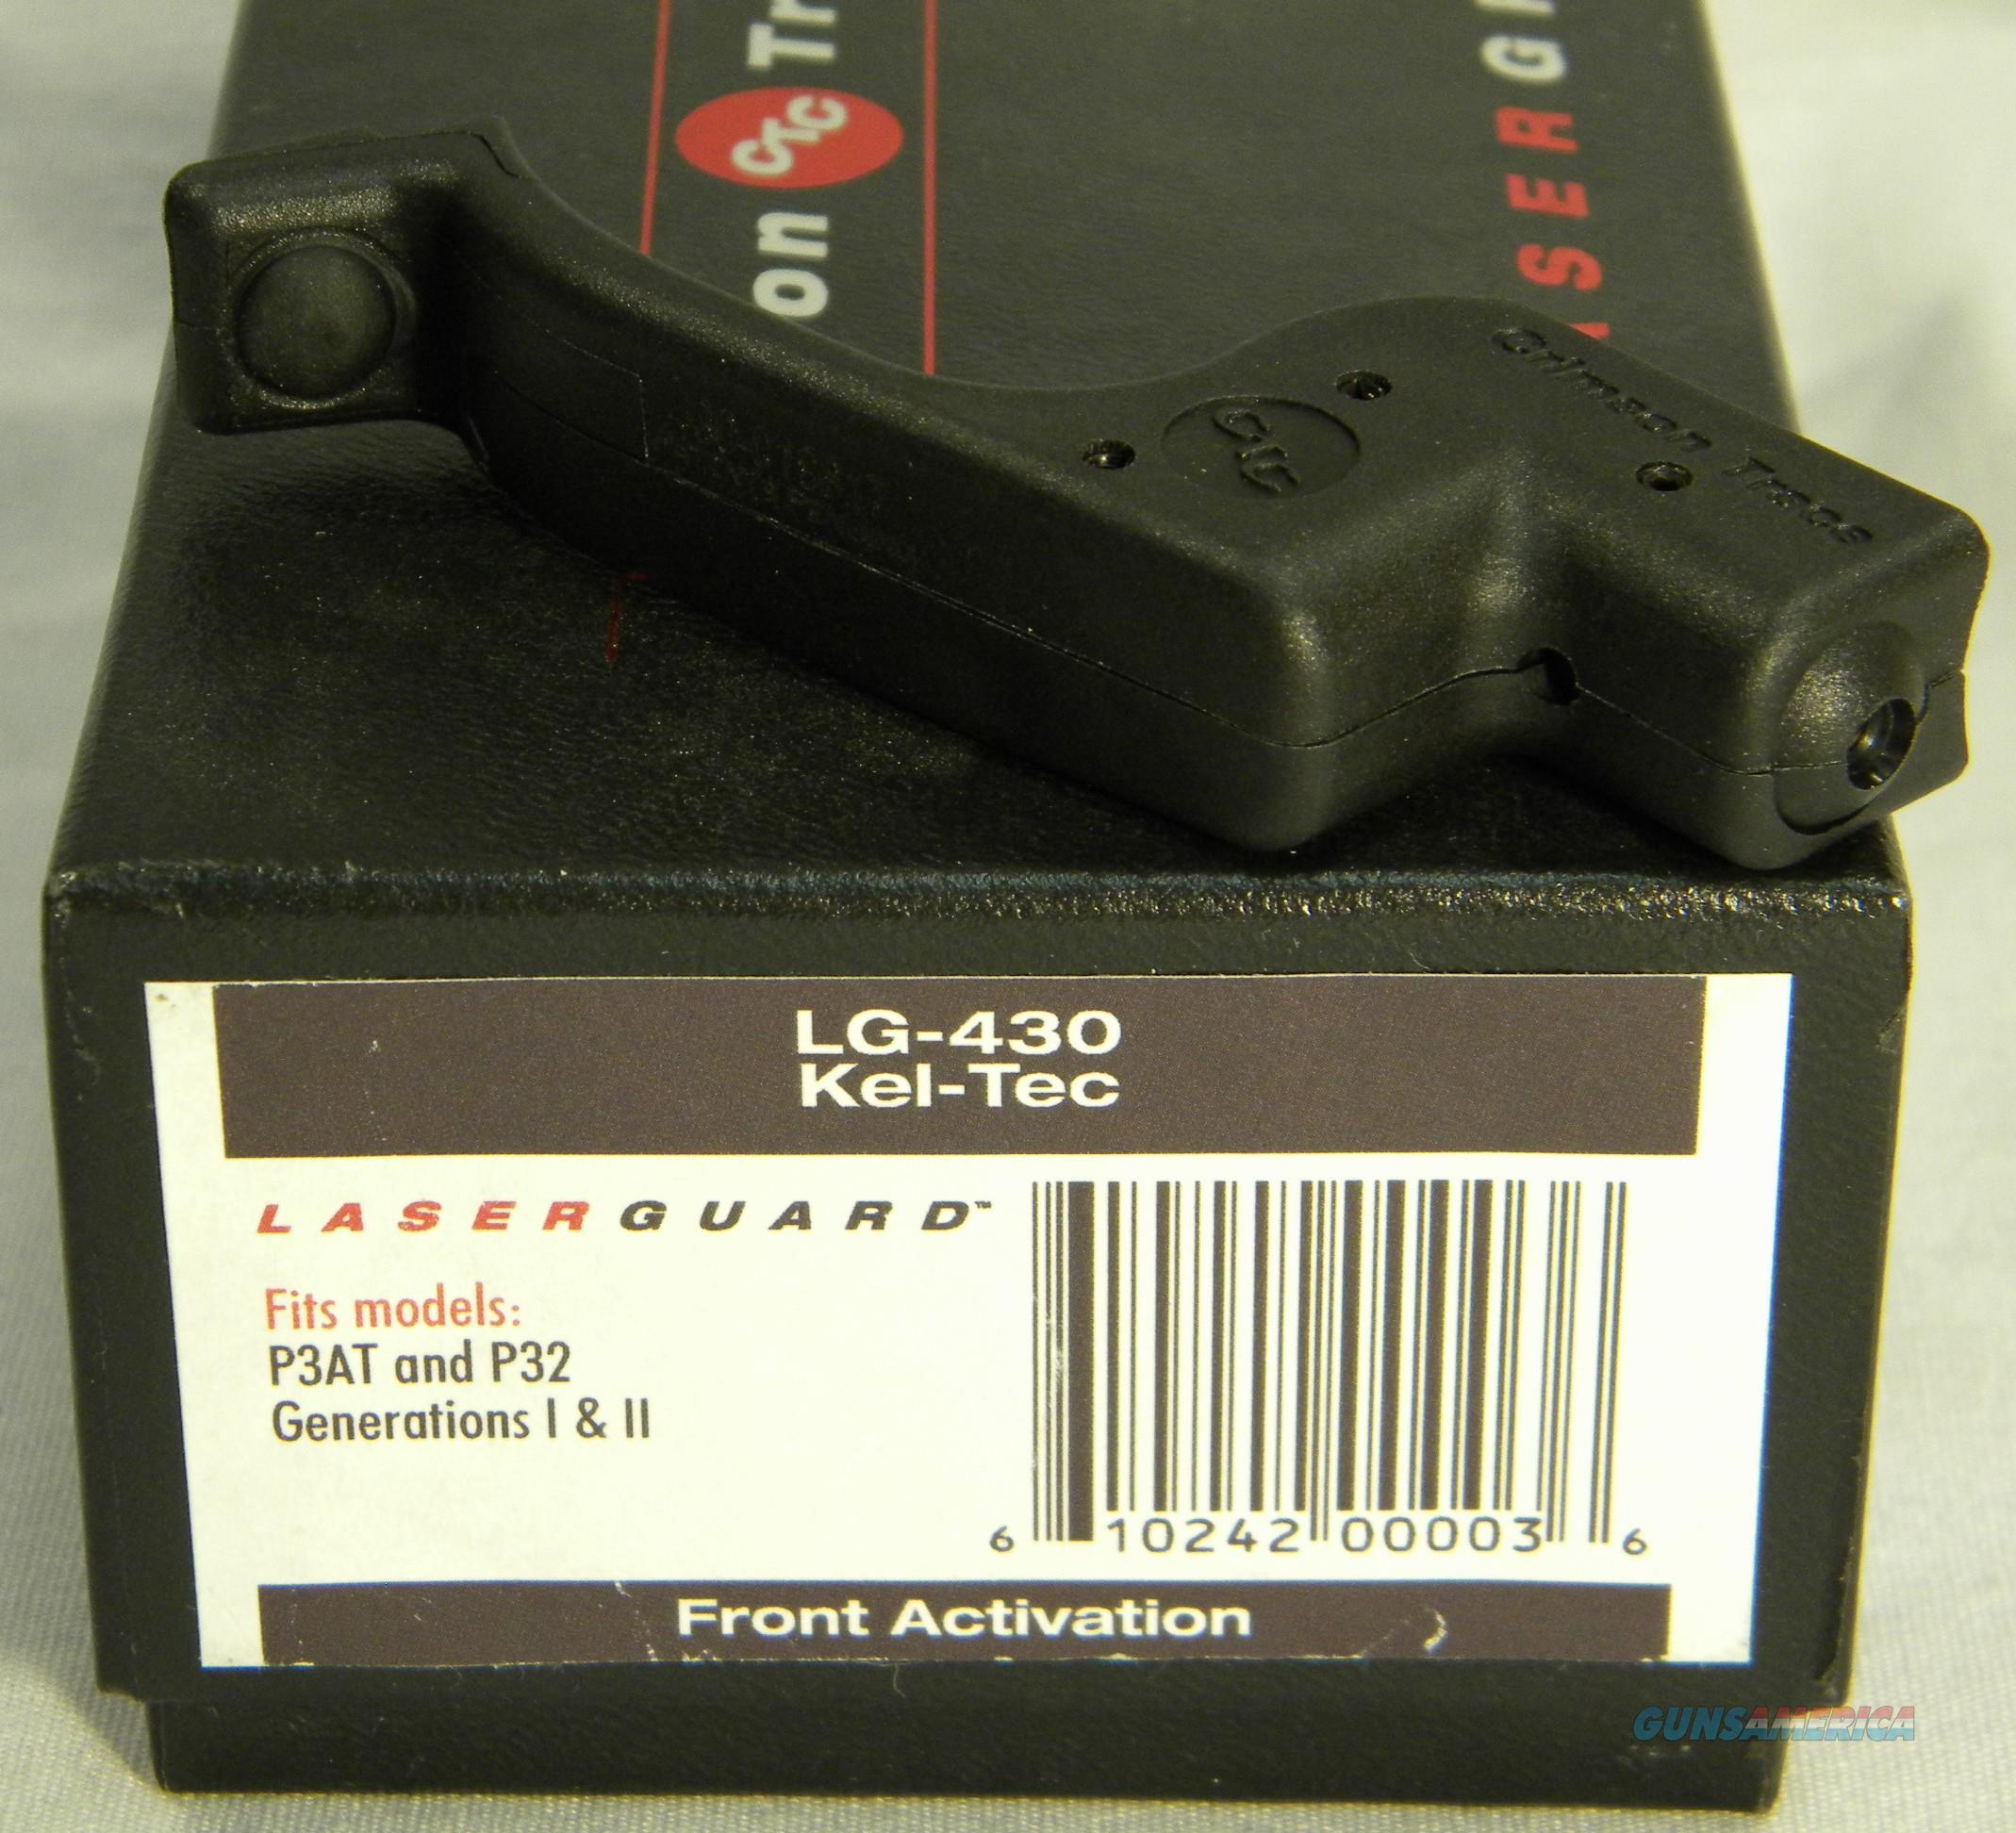 Crimson Trace LG-430 For Kel-Tec P-32 & P3-AT Gen I & II, Crimson Trace Lasers Inventory Reduction Sale!  Non-Guns > Scopes/Mounts/Rings & Optics > Non-Scope Optics > Other